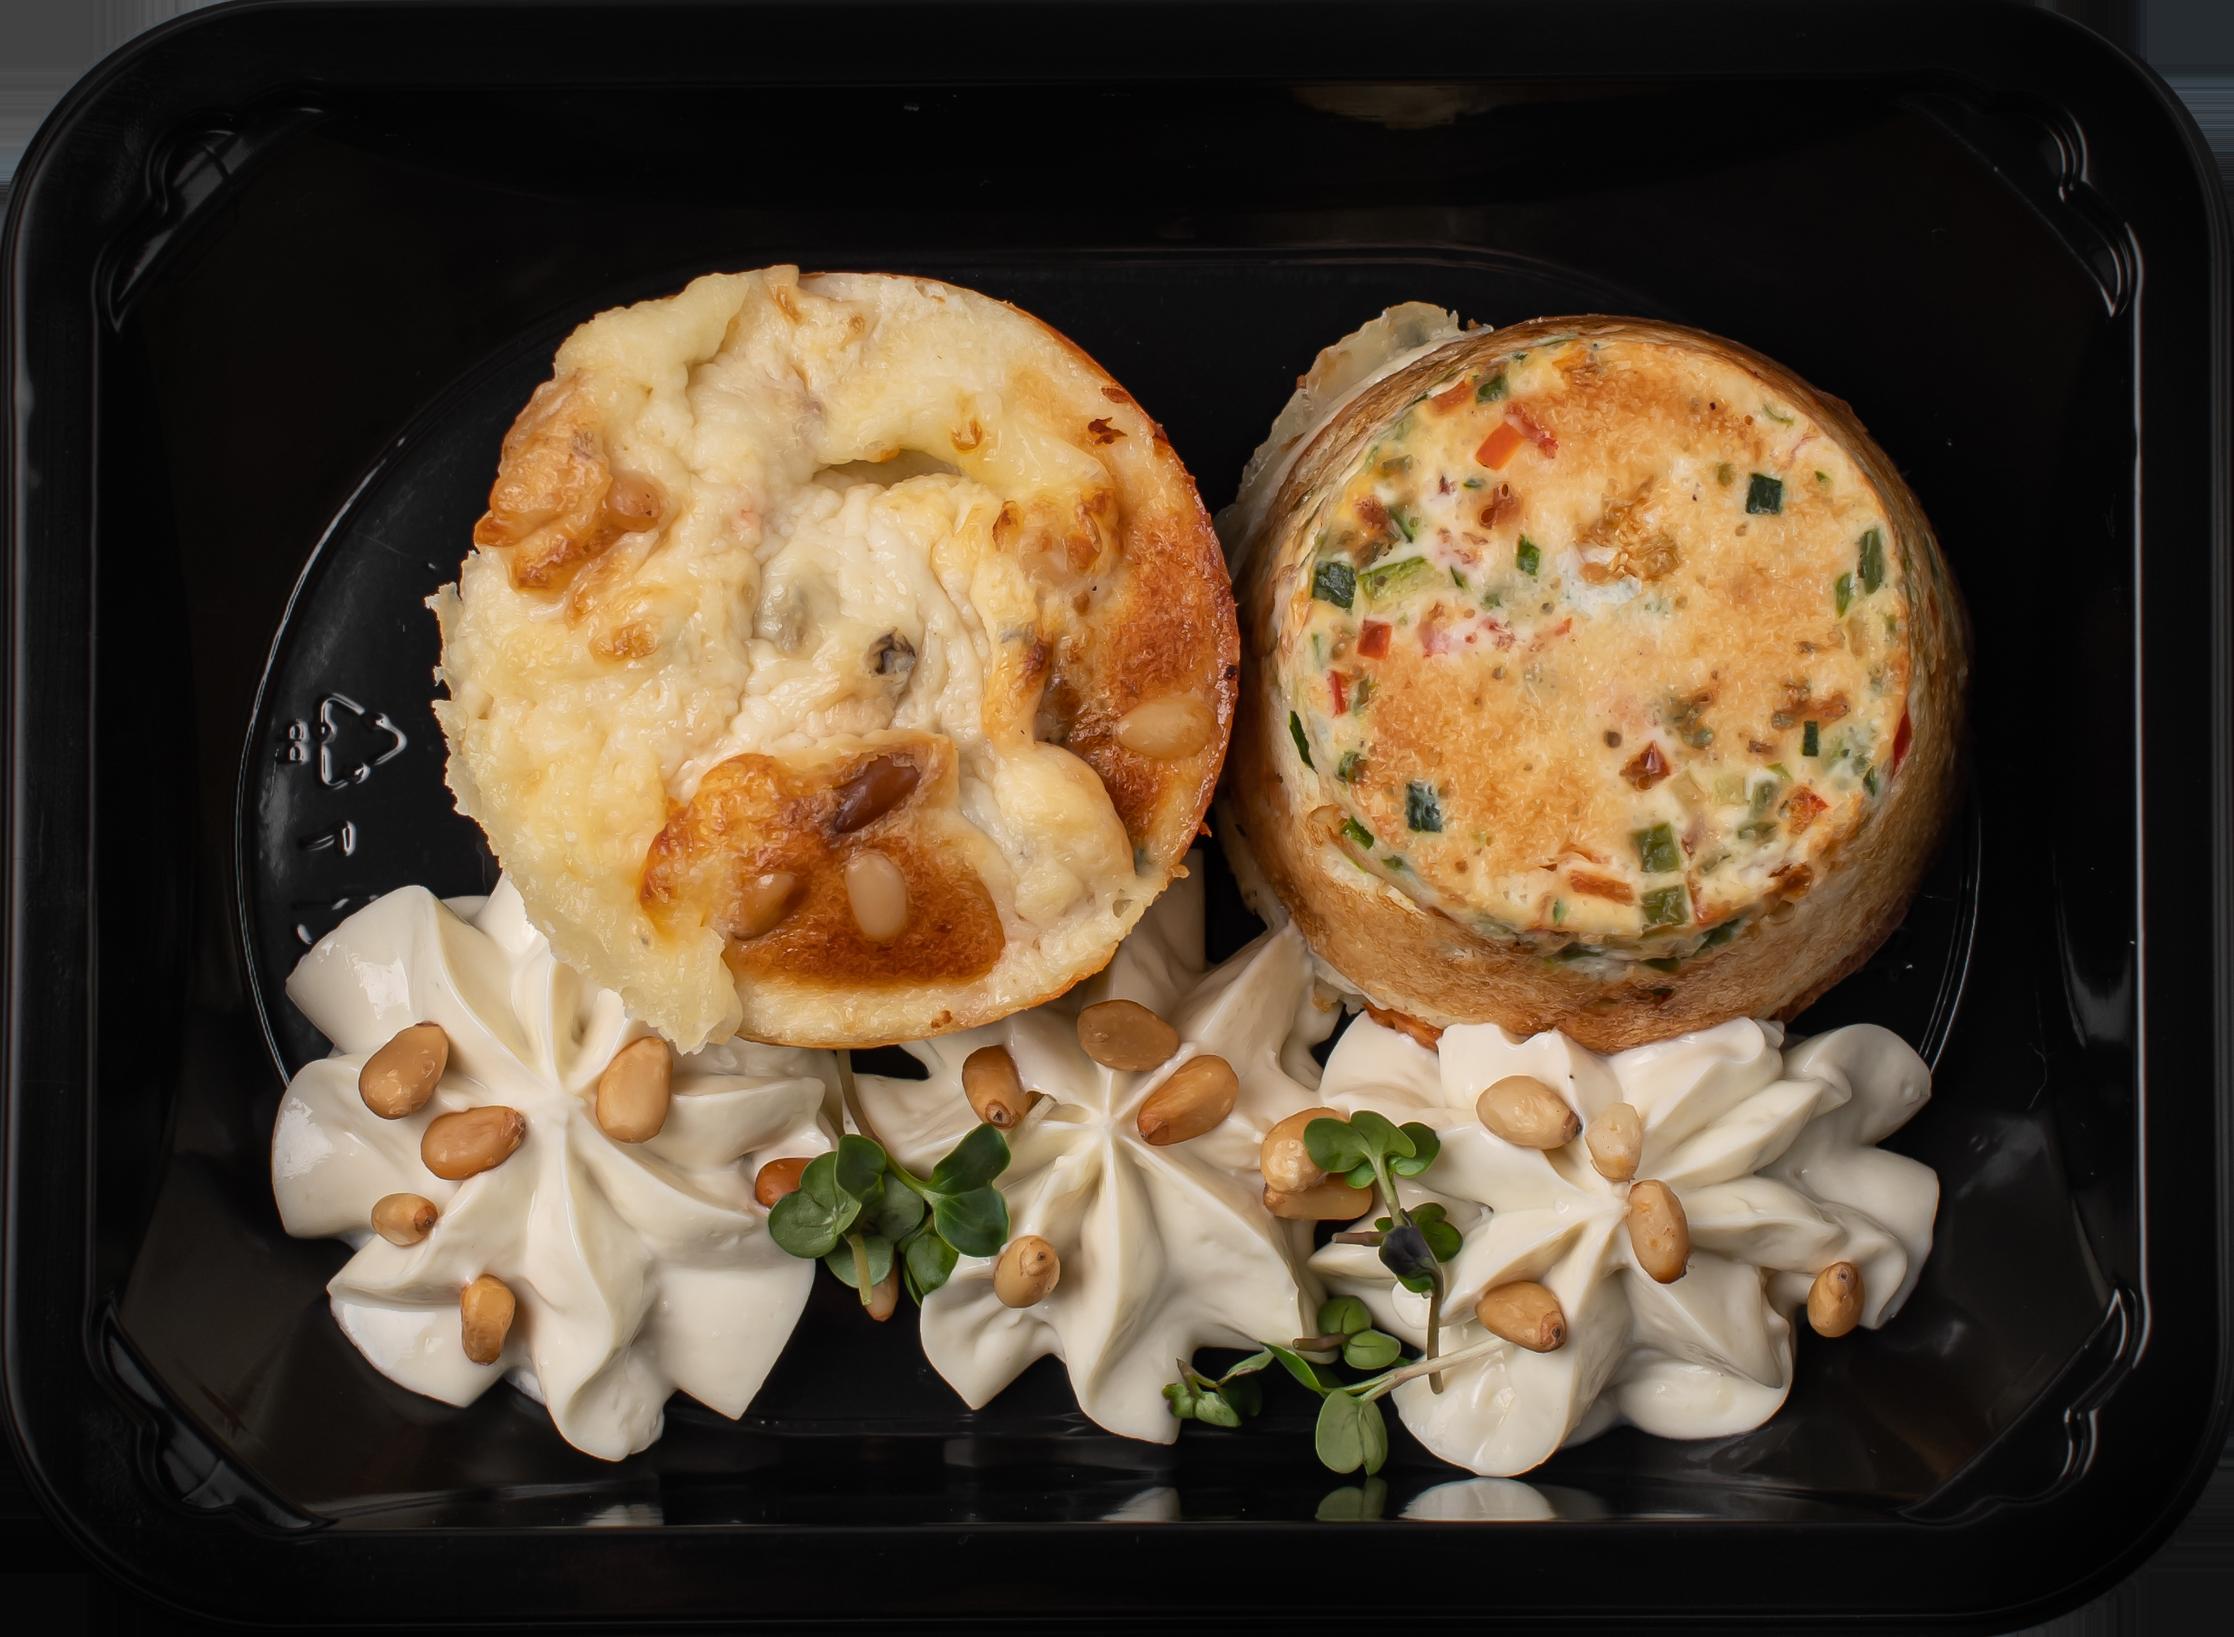 Маффин из сыра Блю-чиз с овощным тар-таром